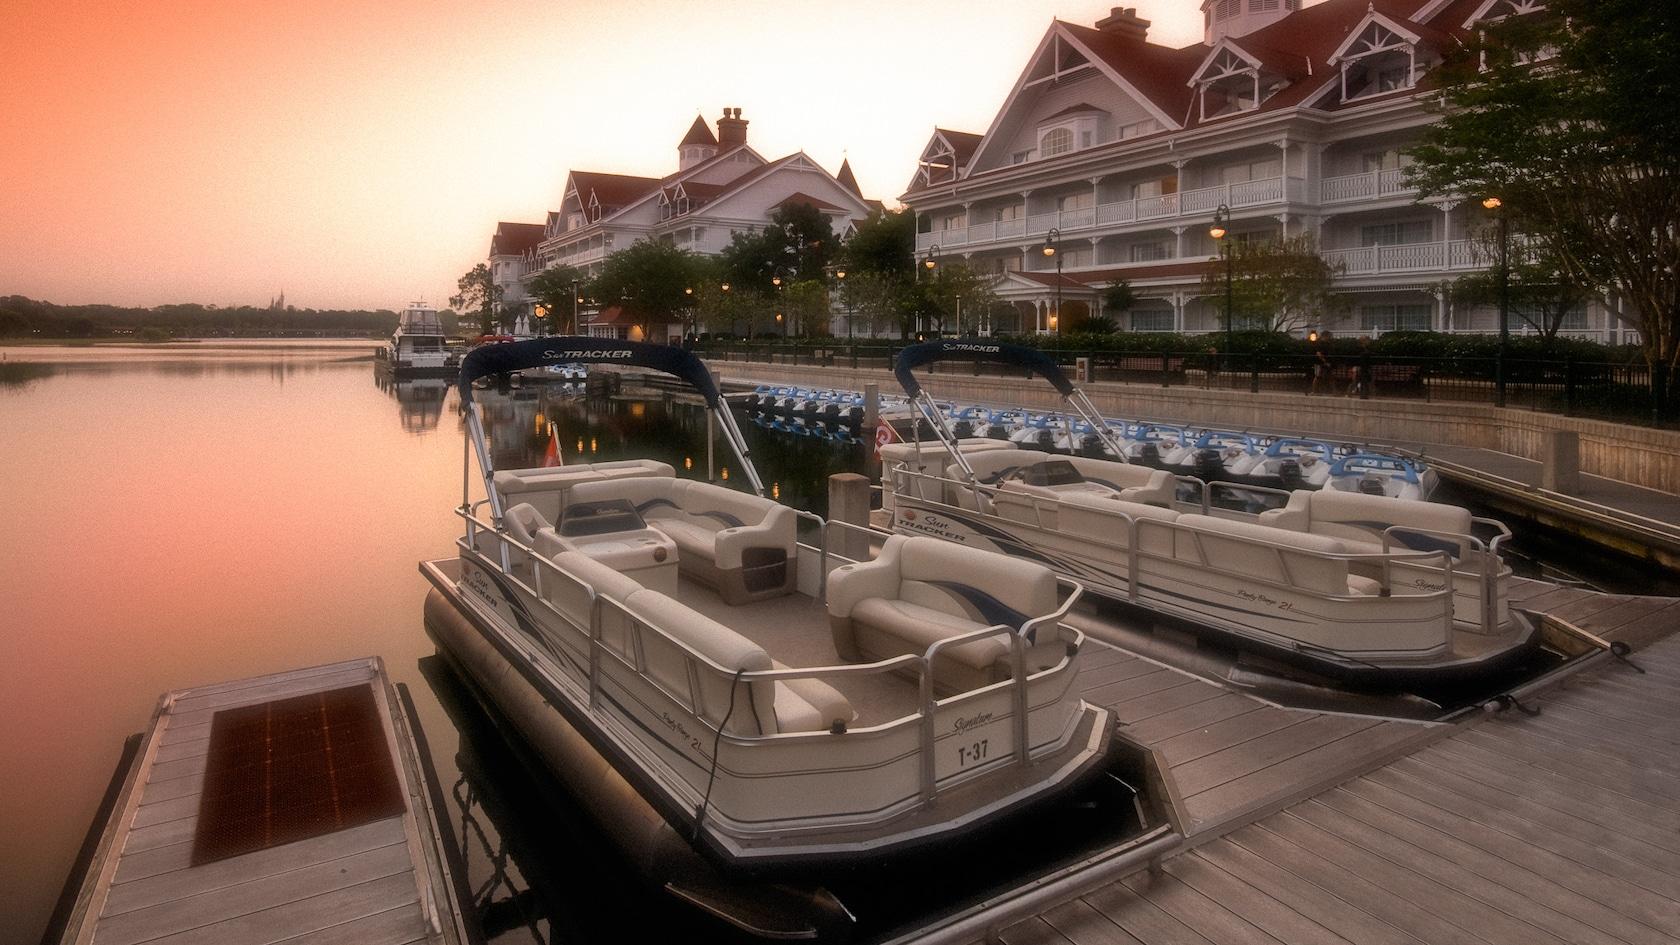 Pontoon Boat rentals returning to Walt Disney World Resort hotels